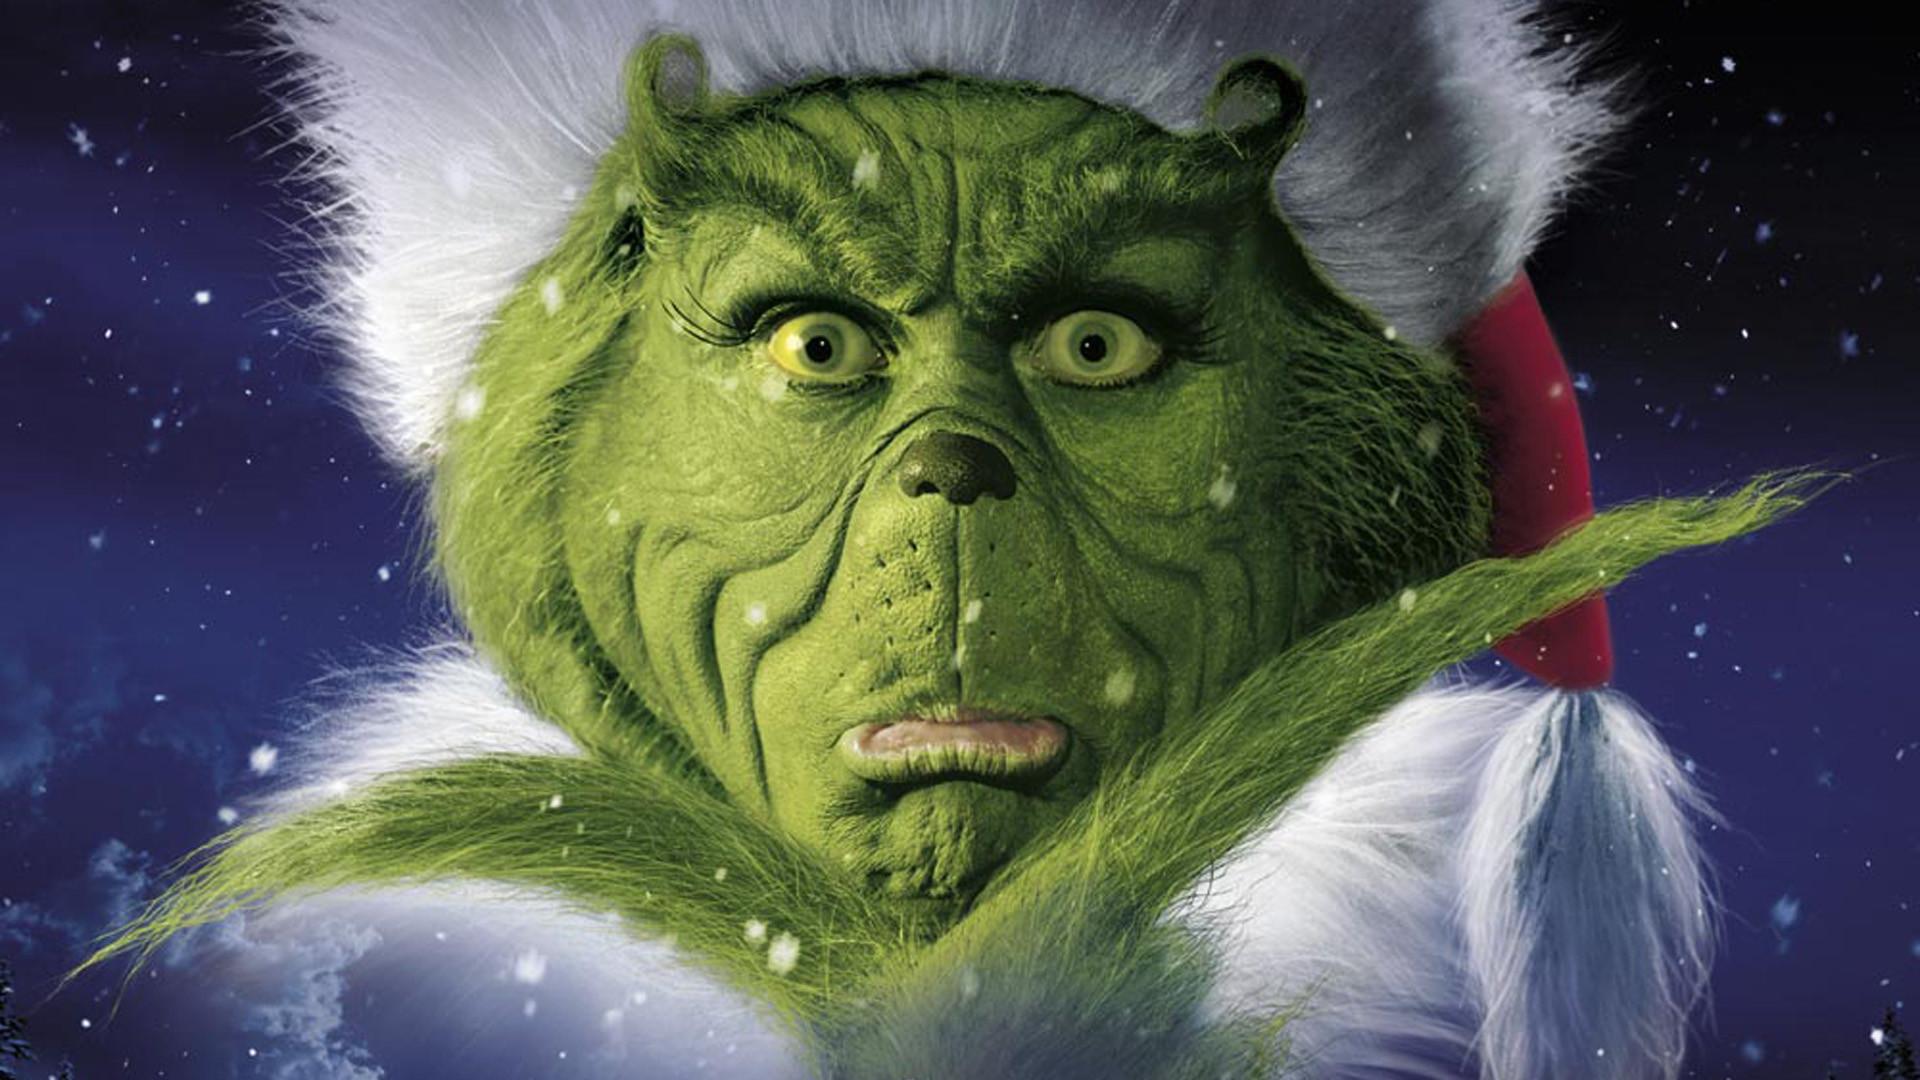 416kB The Grinch Portrait Christmas Wallpaper   Christmas Cartoon 1920x1080